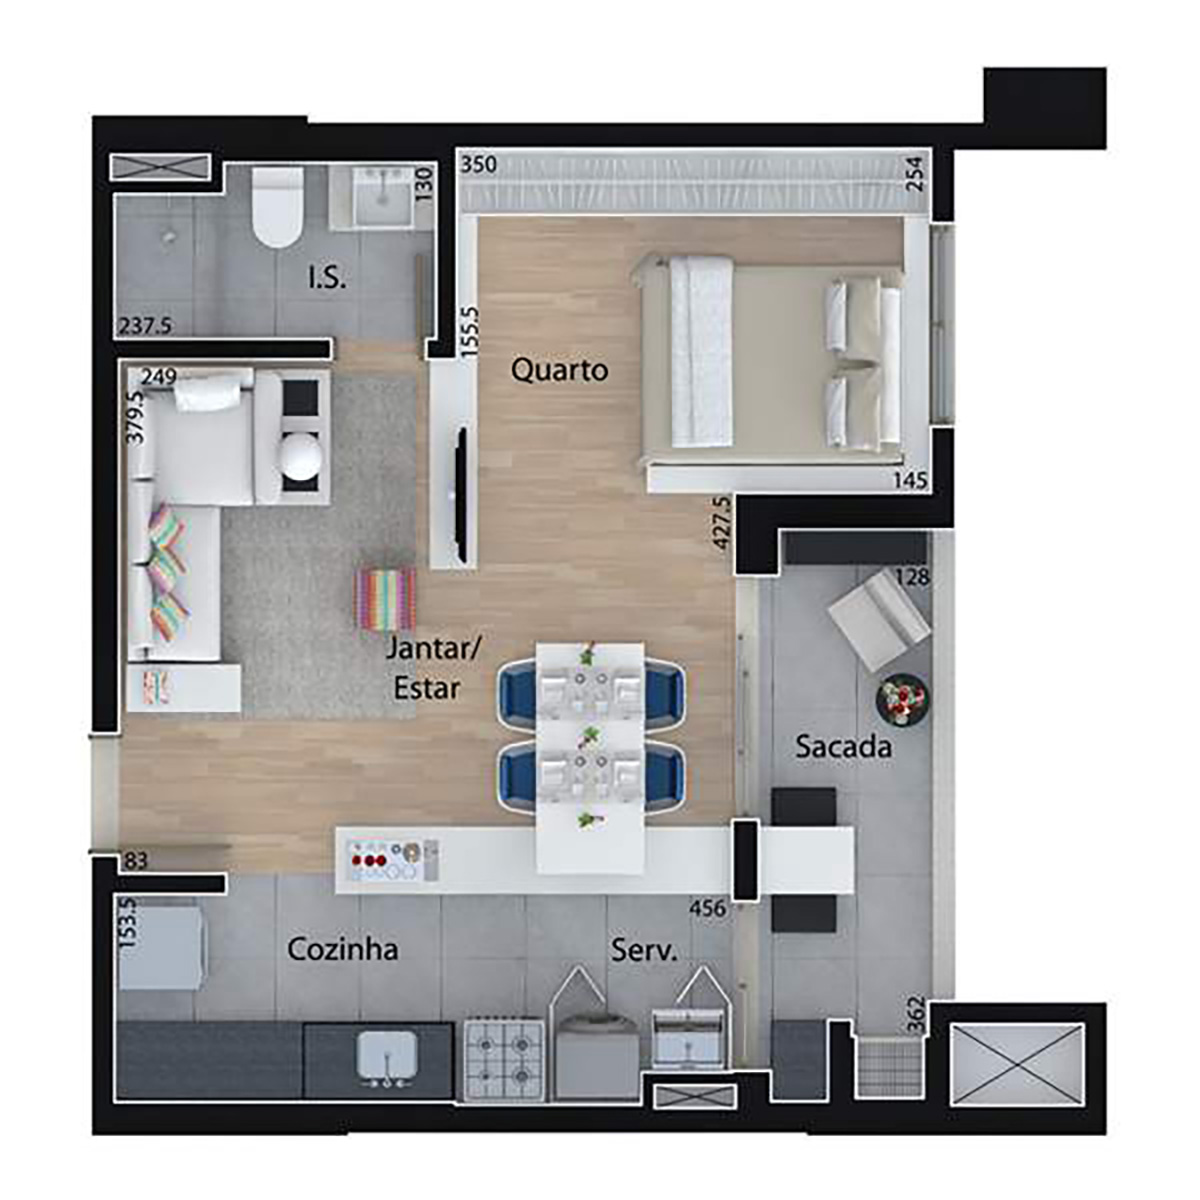 46 m² | 1 Dorm com sala ampliada Mid Home